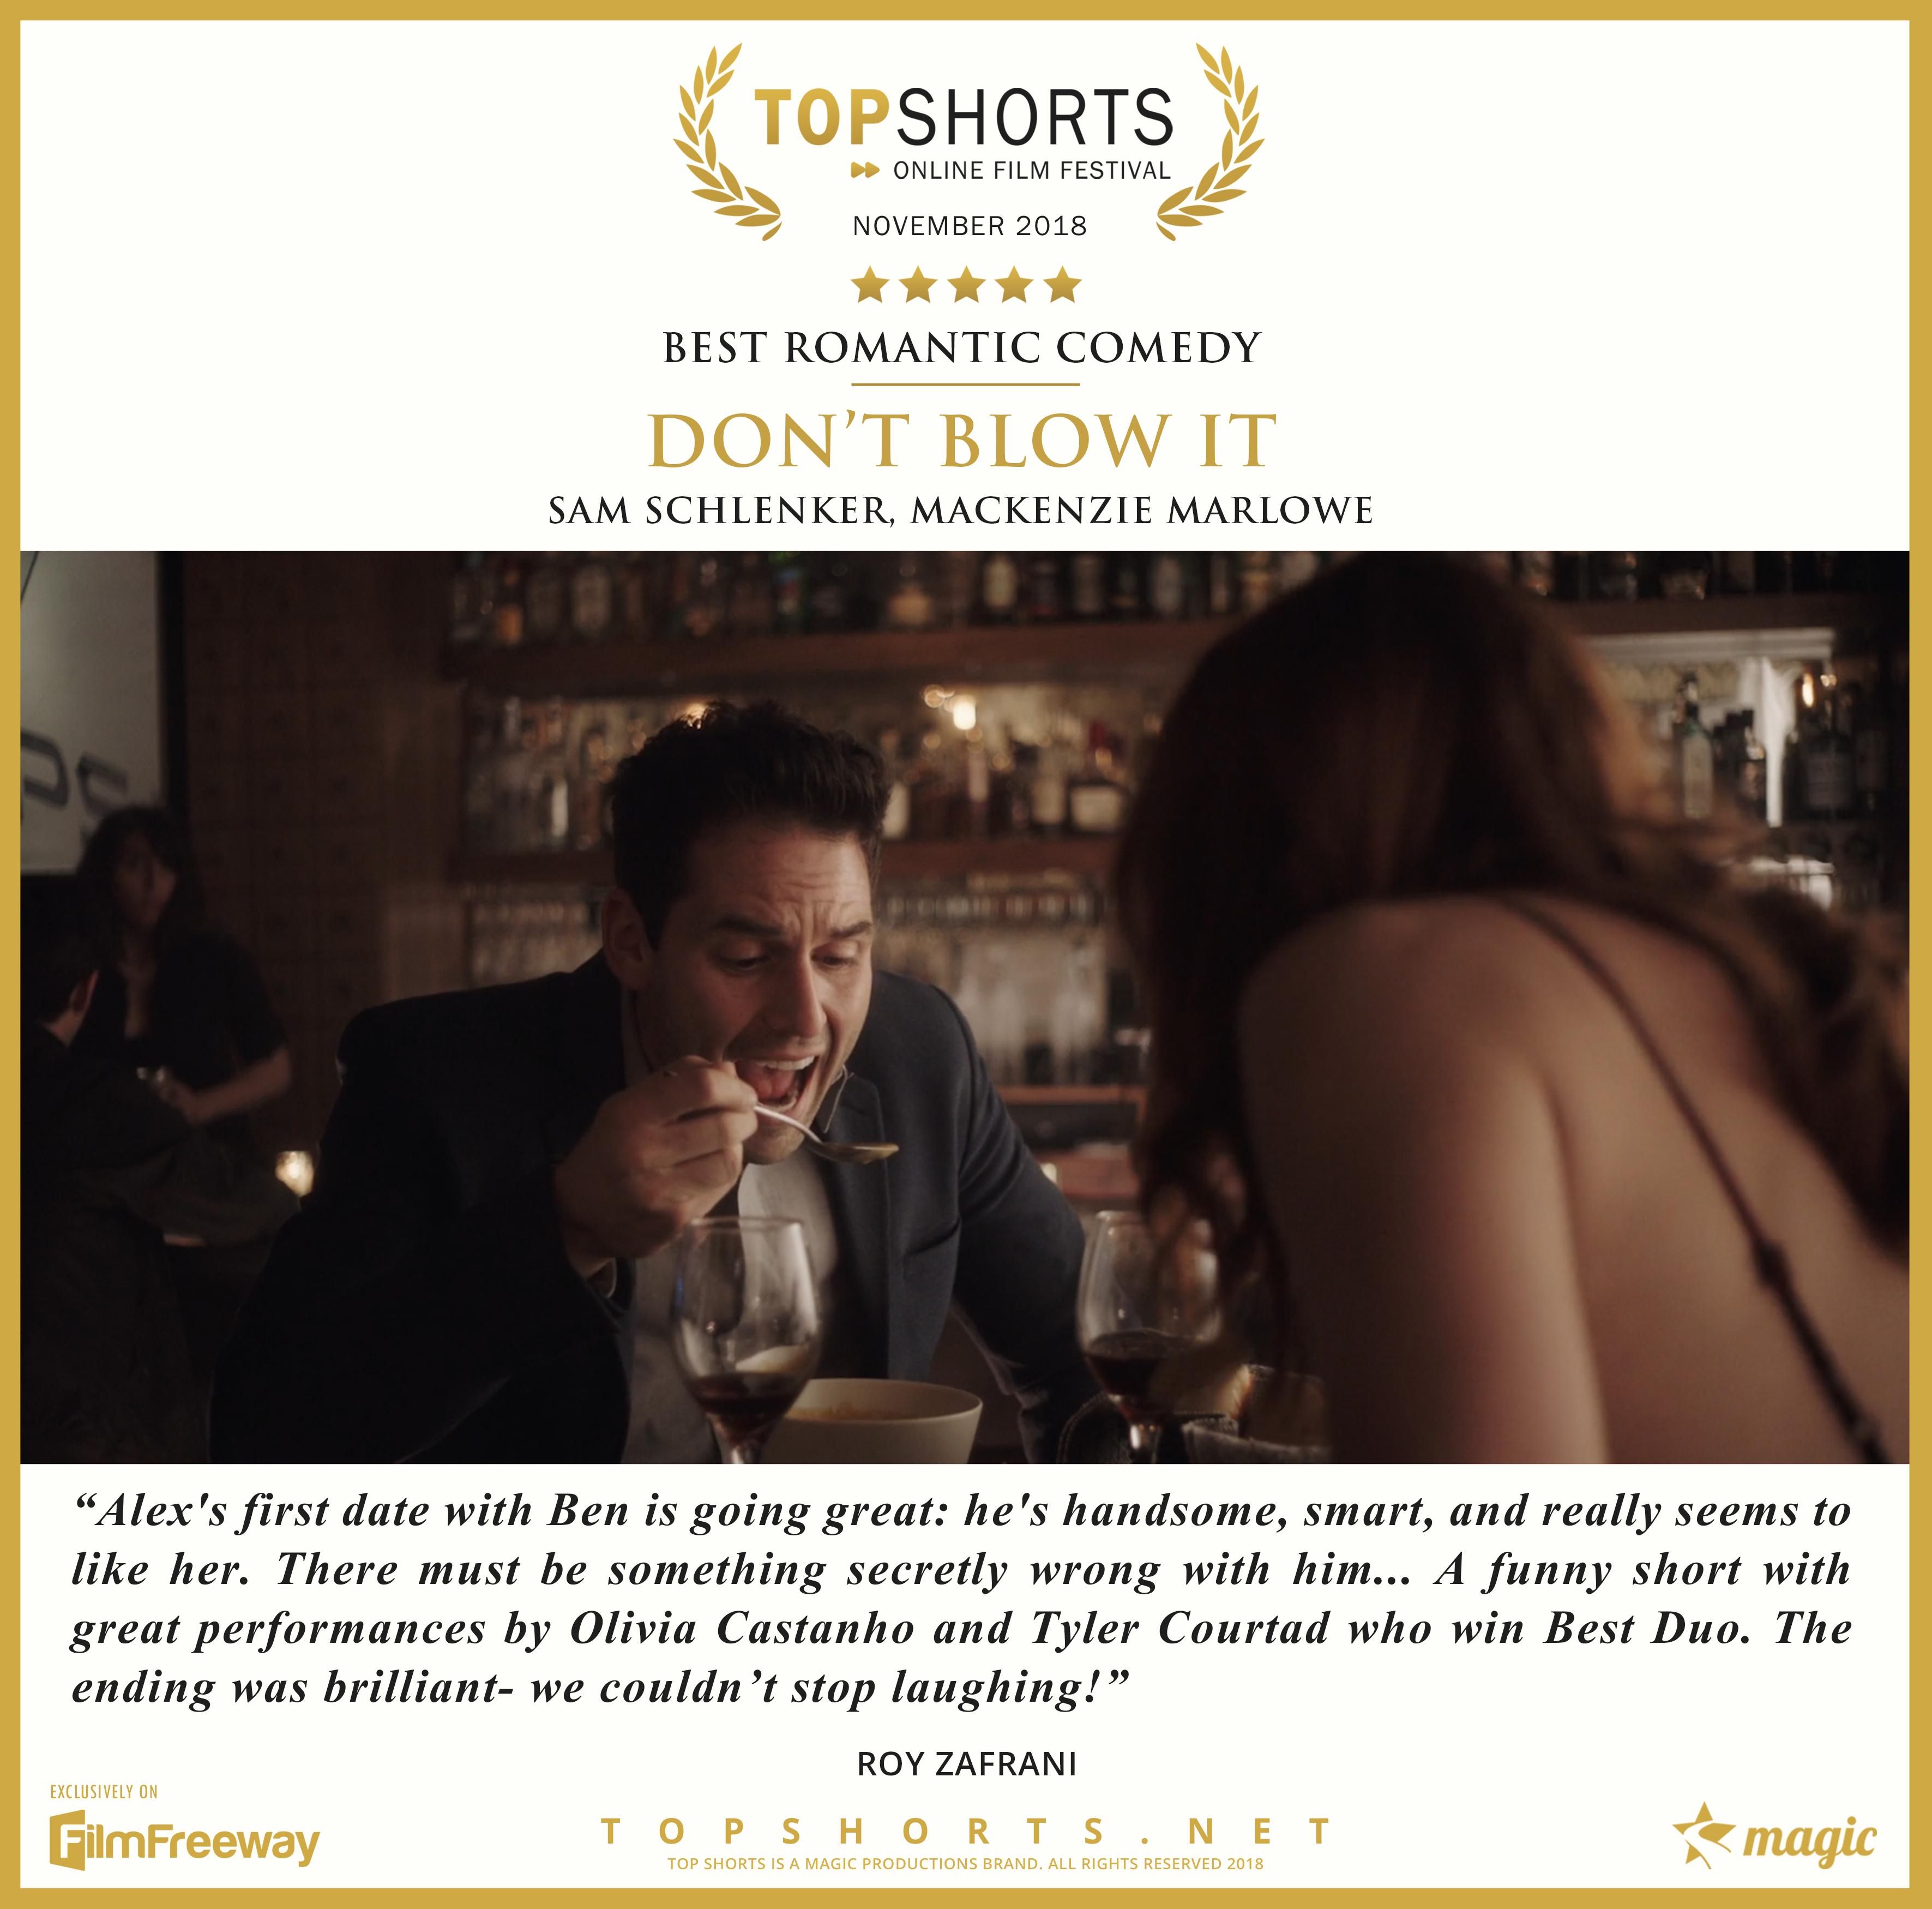 2018 11 Best Romantic Comedy - Don't Blo